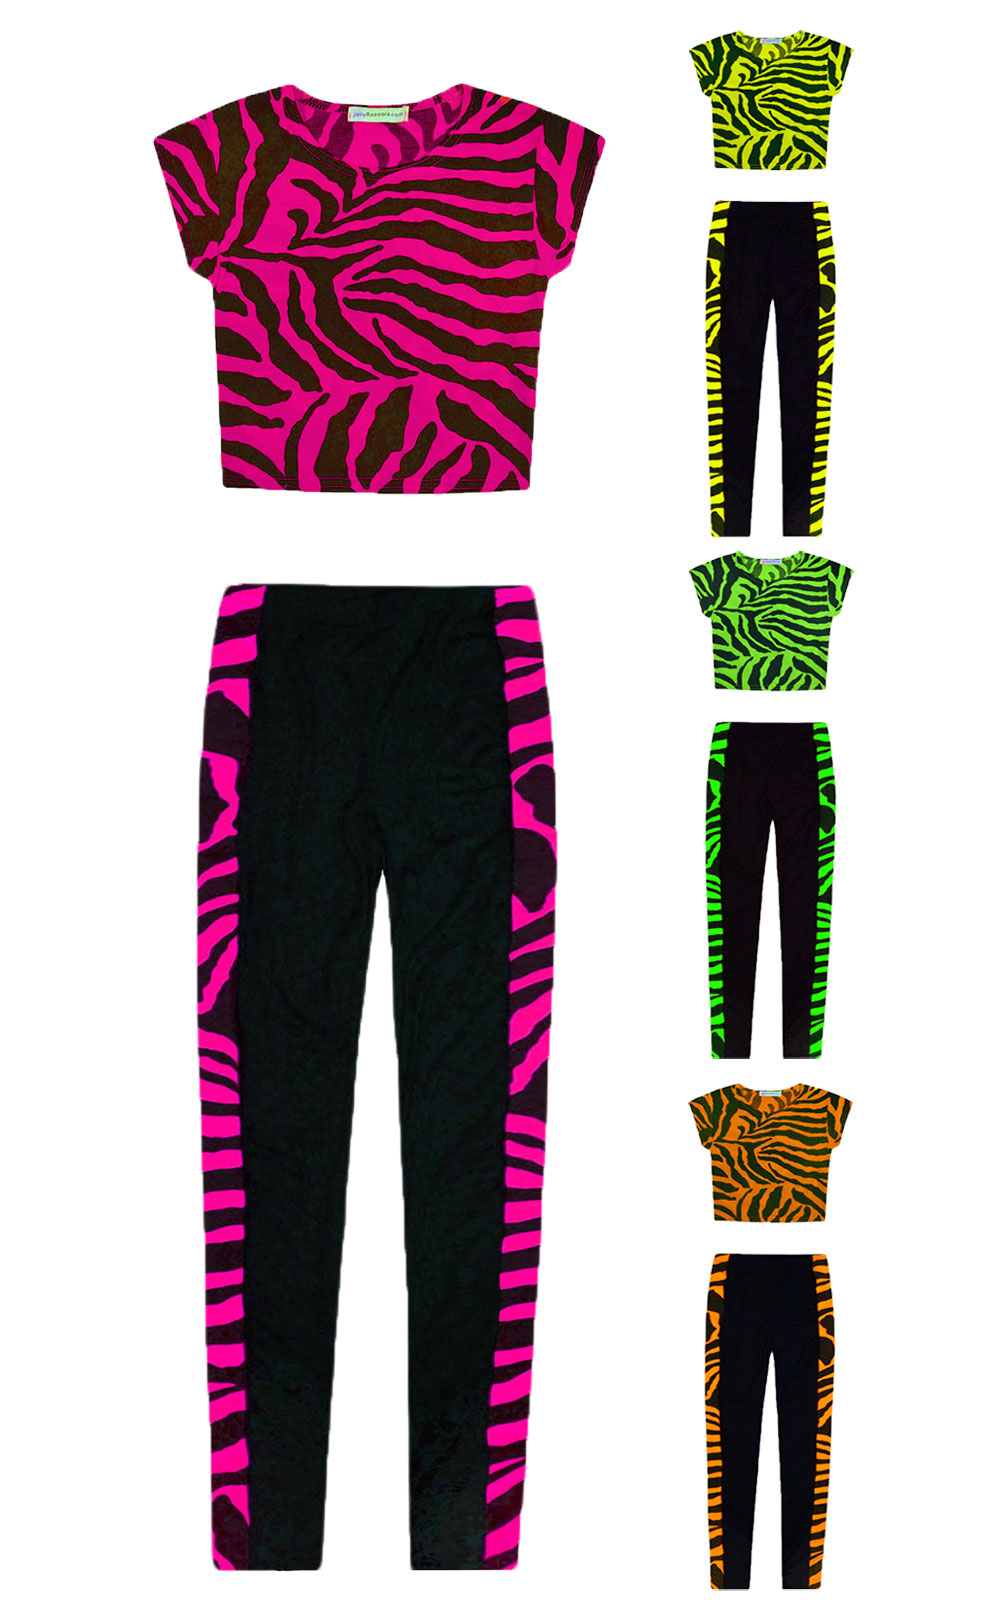 7f2ebc49ca8ad5 Girls Dance Set Neon Crop Top And Zebra Legging 2 Piece Set New Kids Age 5-13  Yr